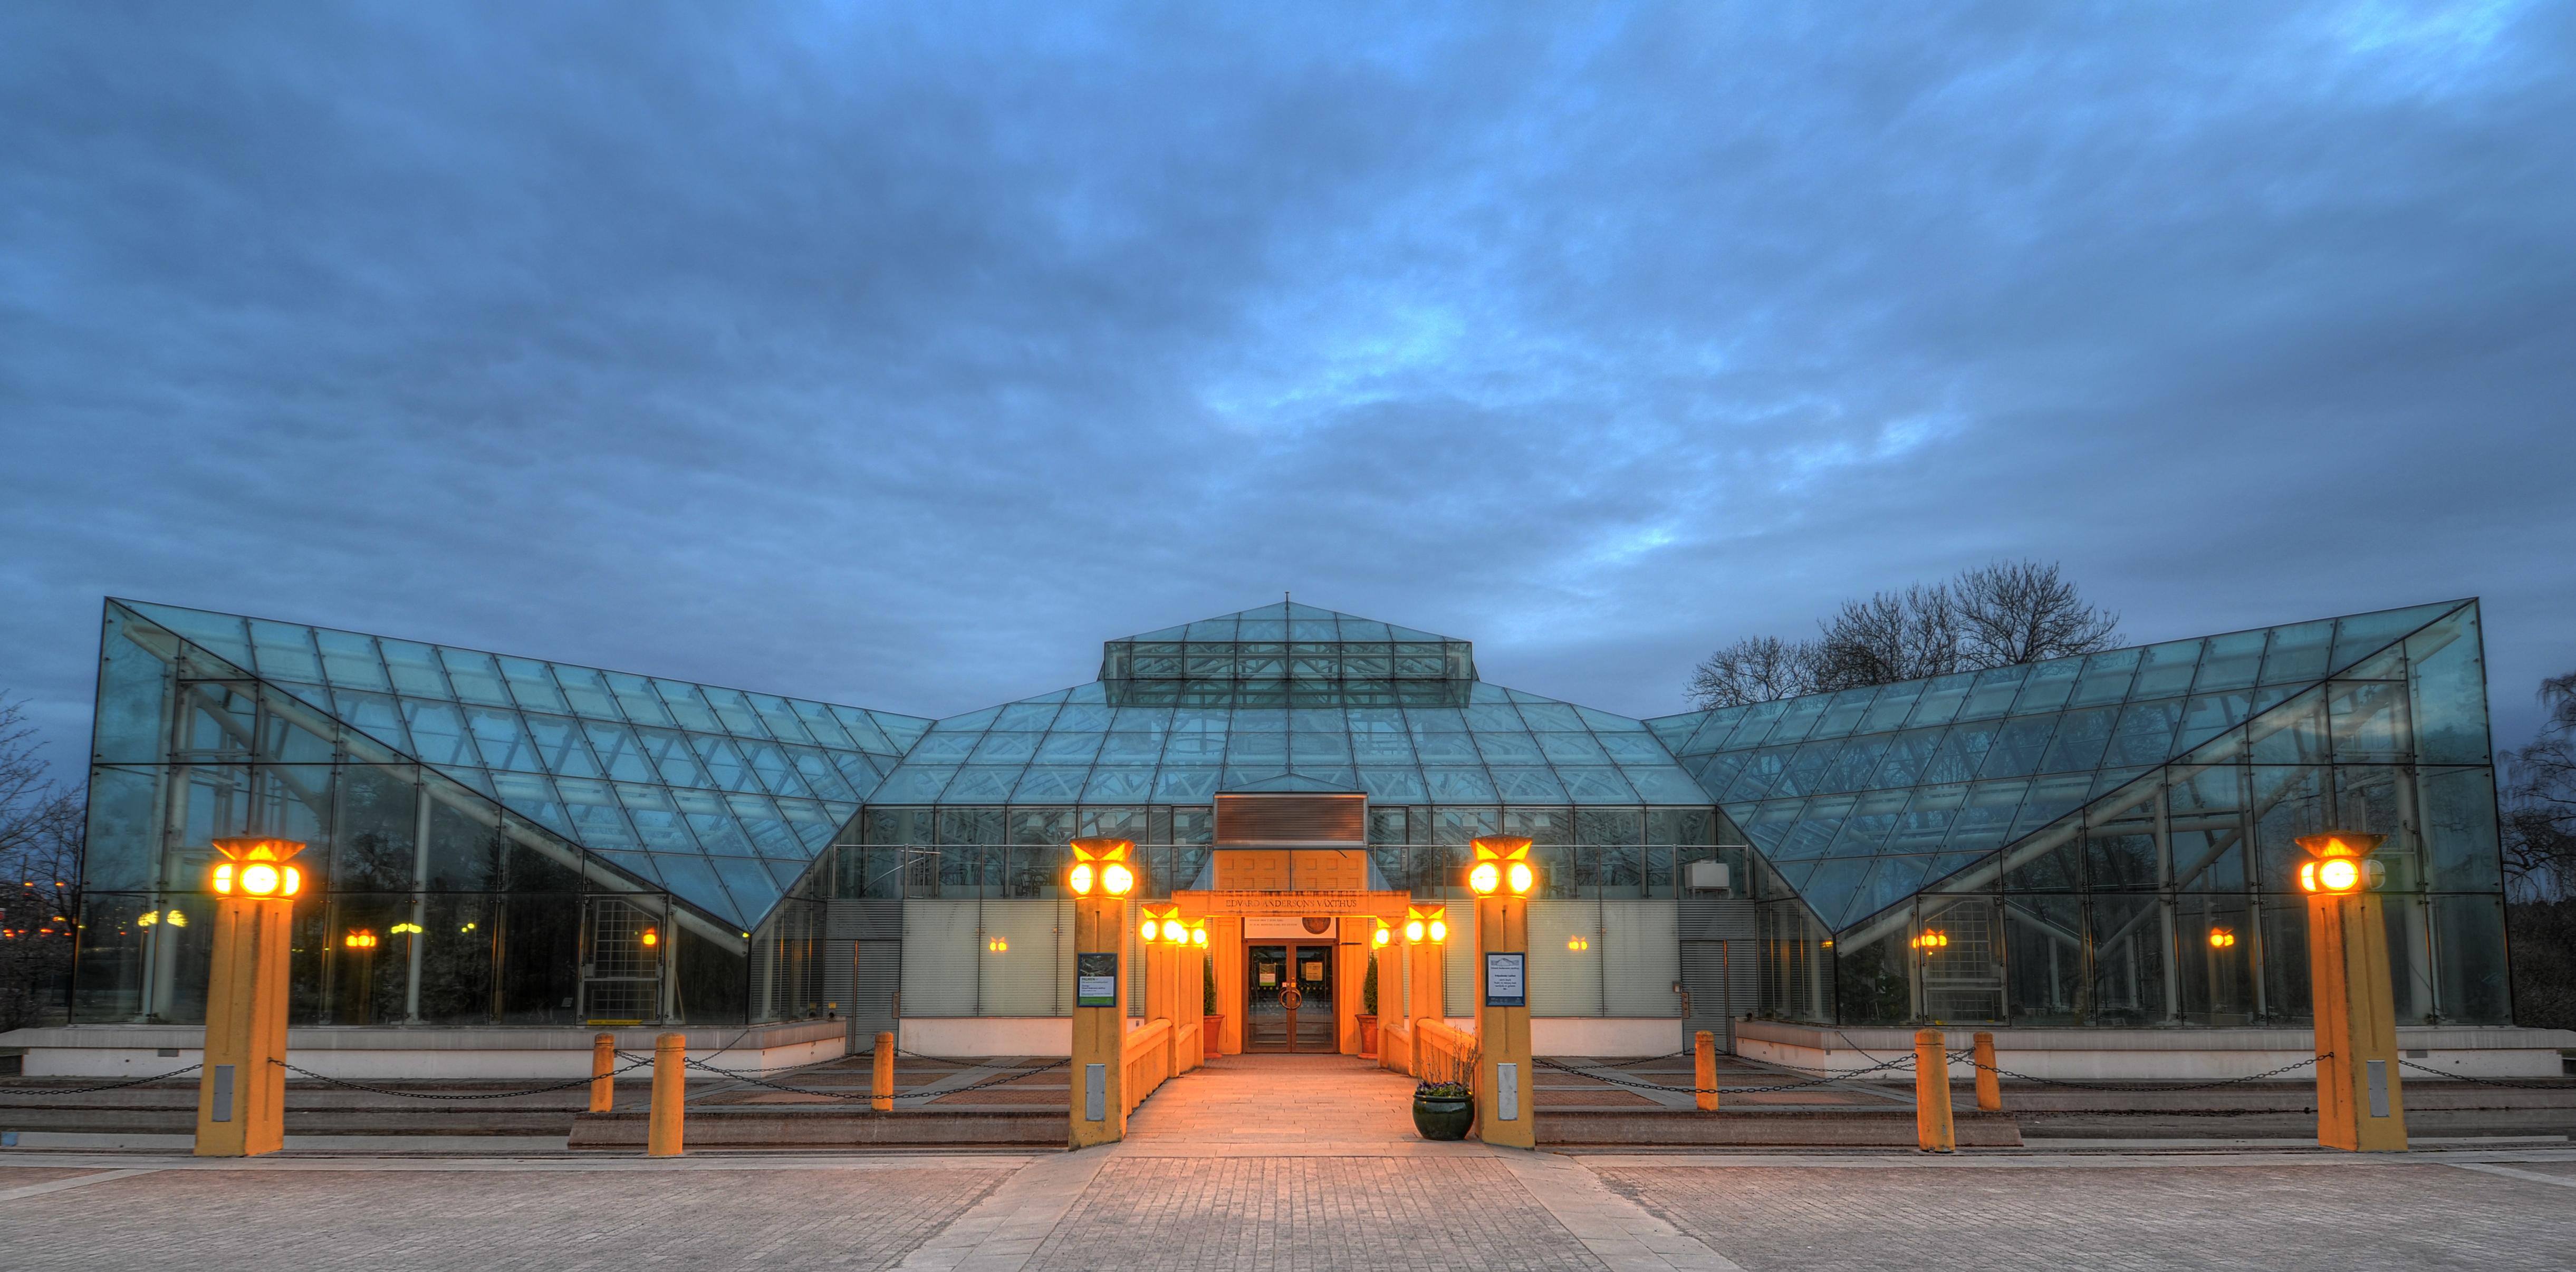 Edvard Anderson's Greenhouse by HenrikSundholm